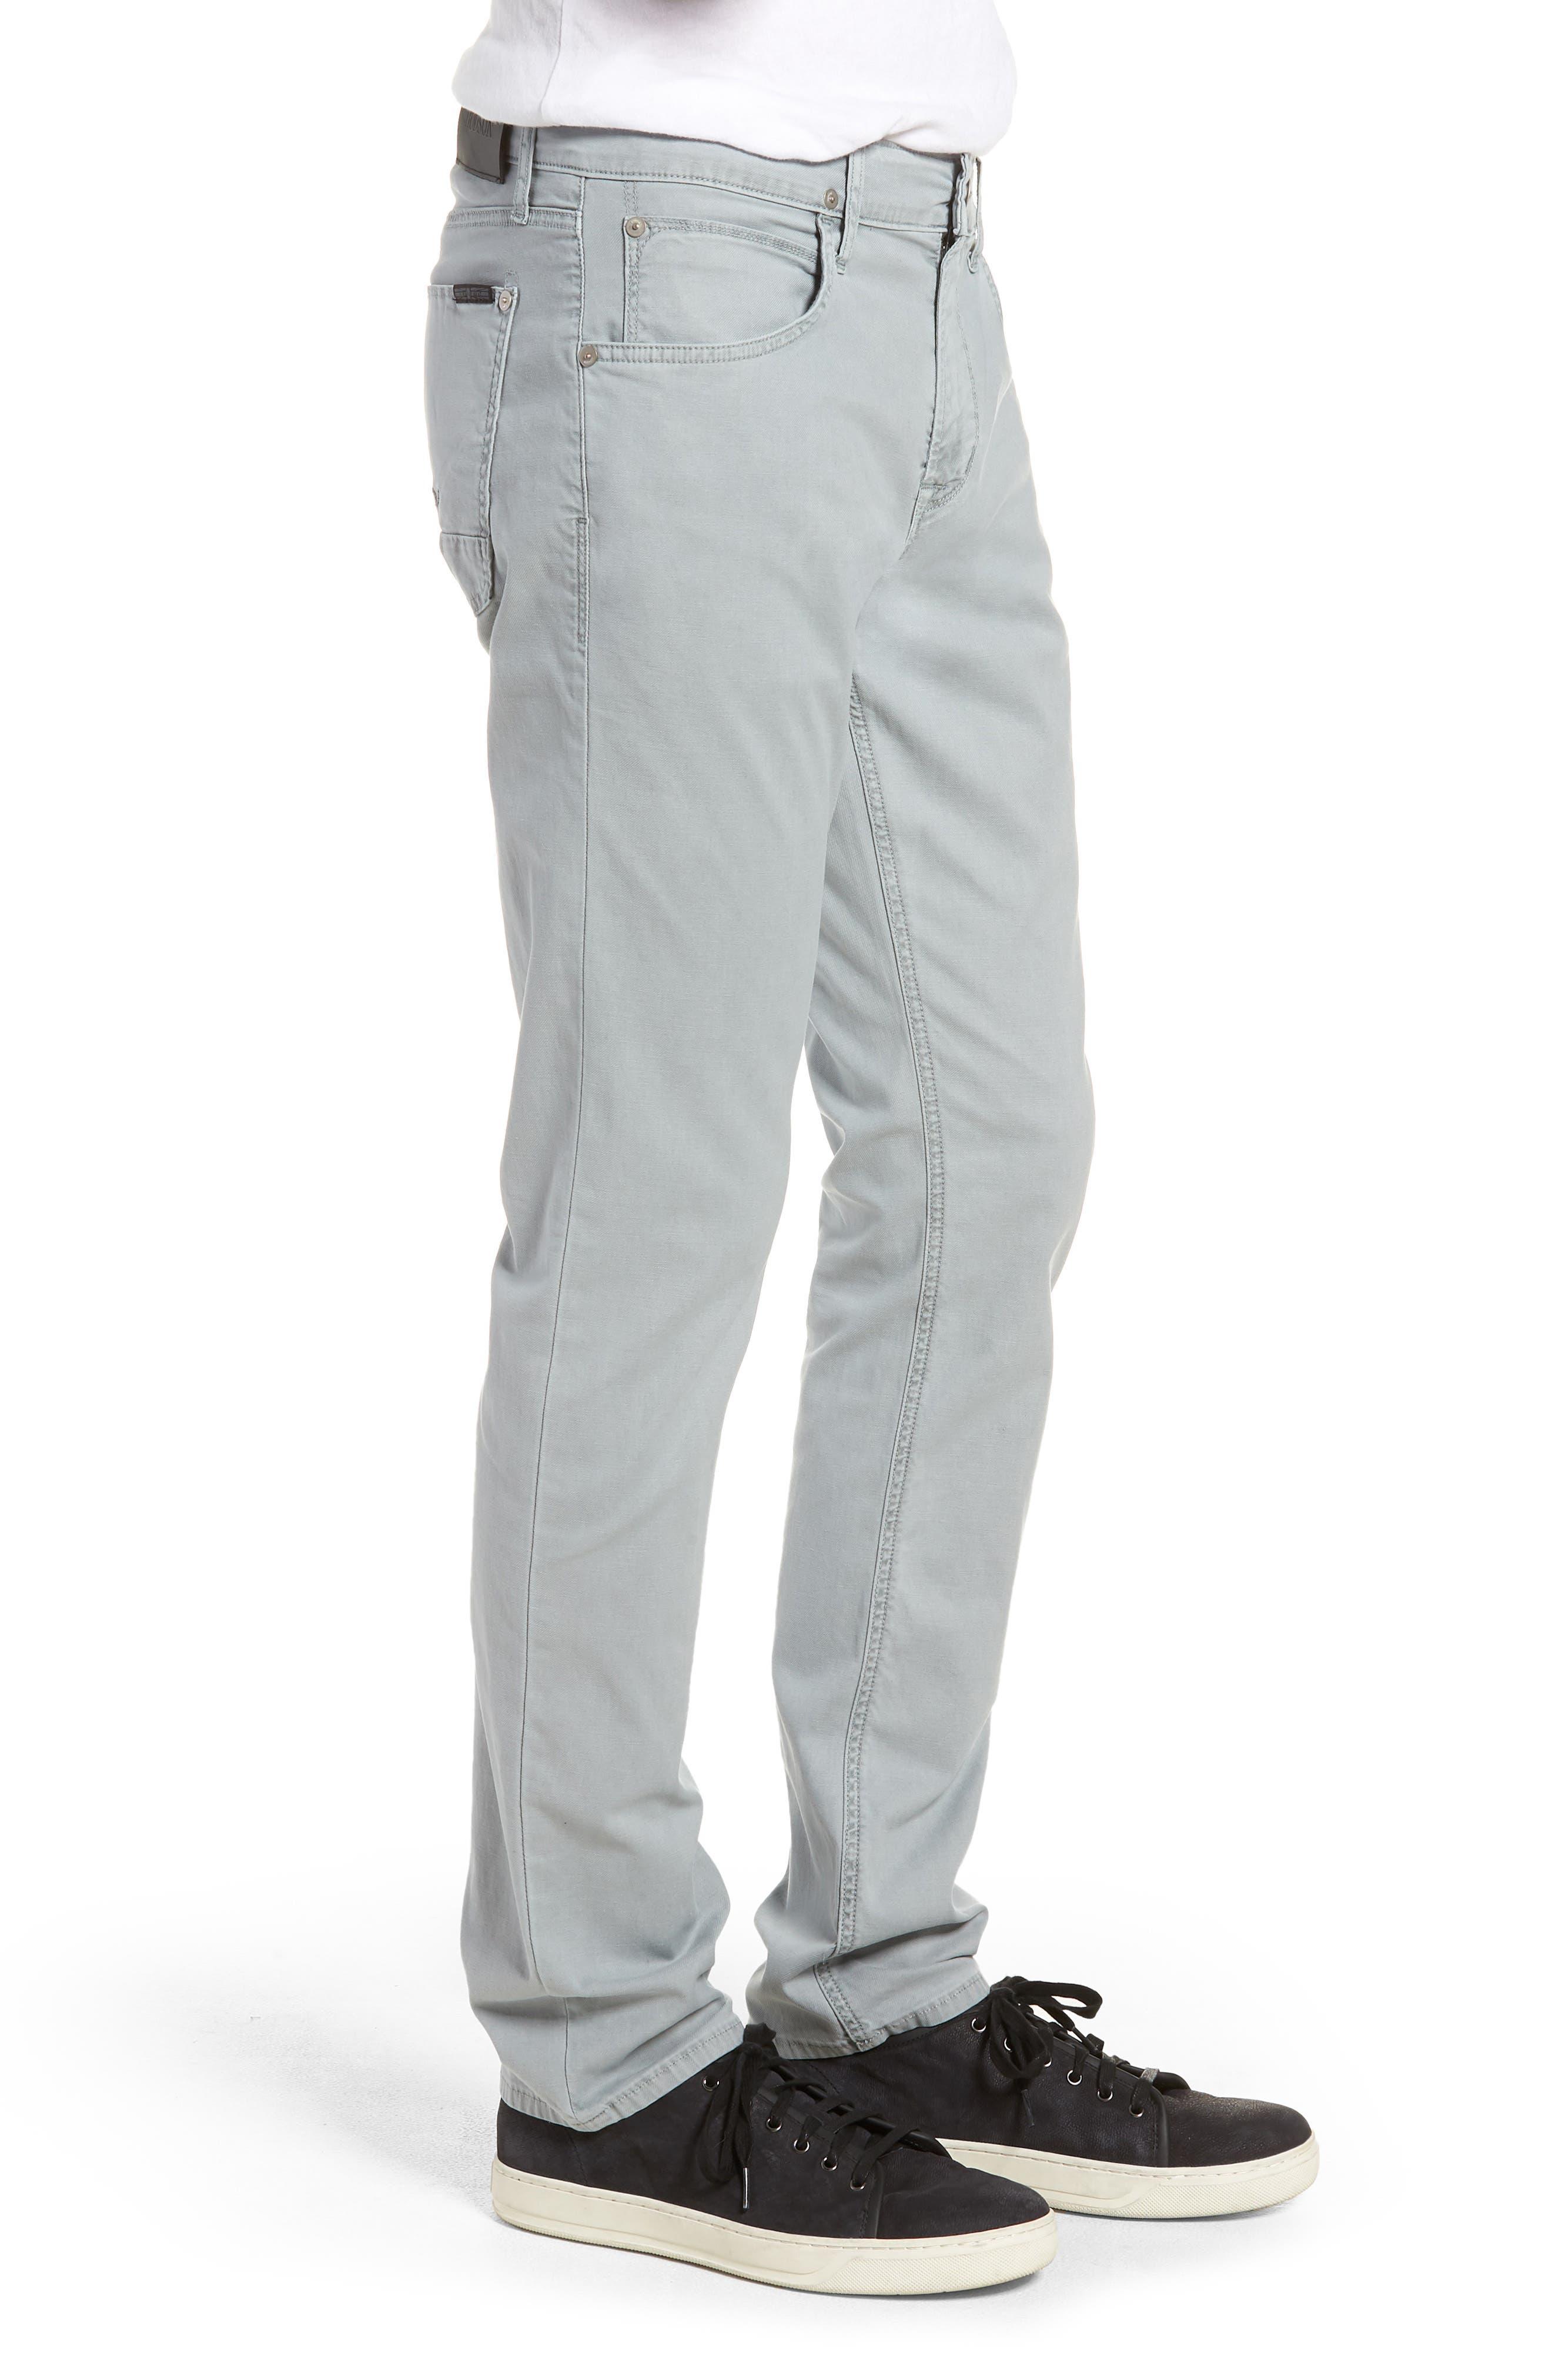 HUDSON JEANS,                             Blake Slim Fit Jeans,                             Alternate thumbnail 3, color,                             400